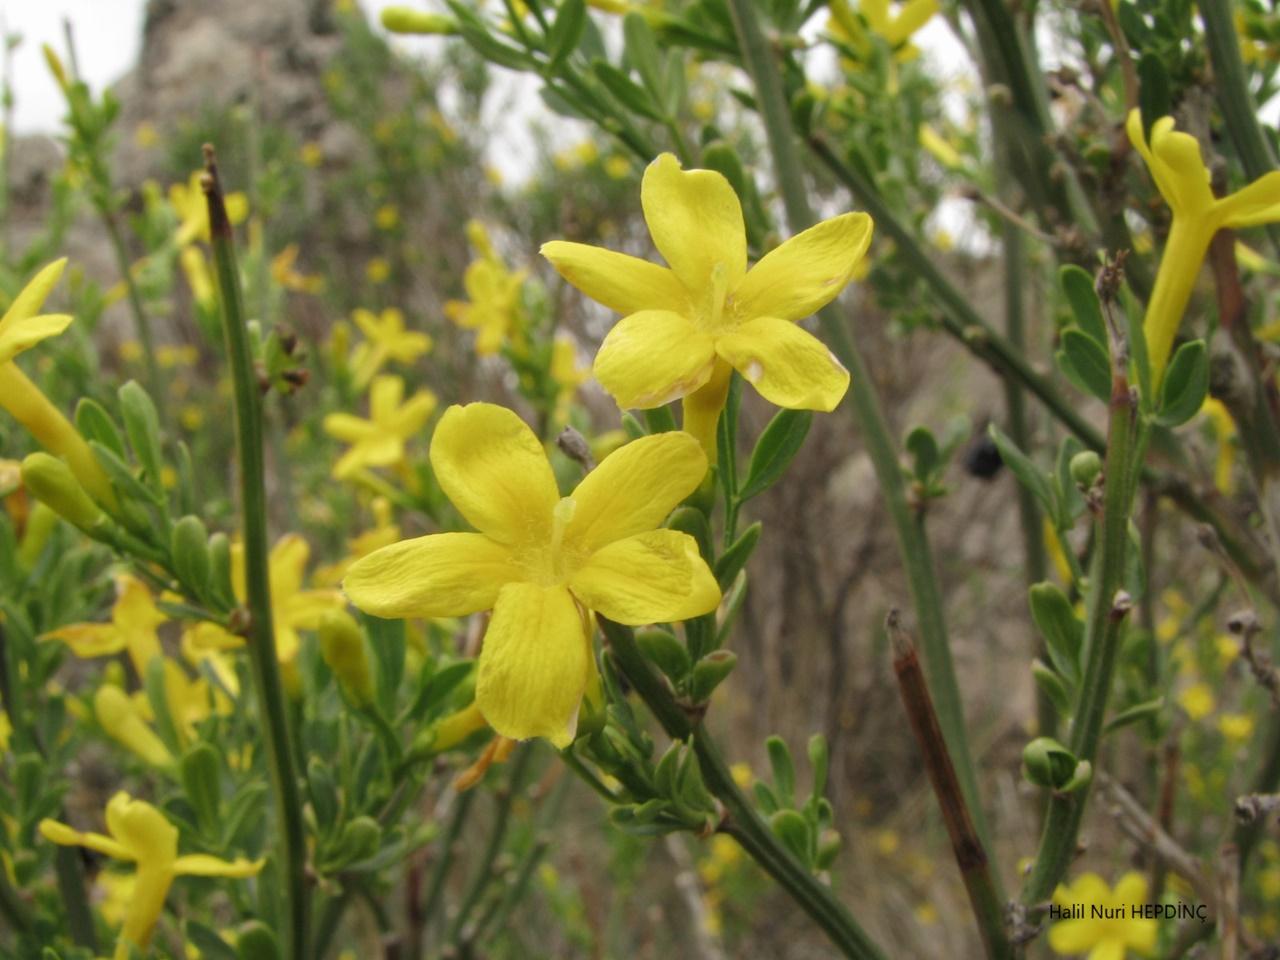 Boruk, Yabani yasemin (Jasminum fruticans)